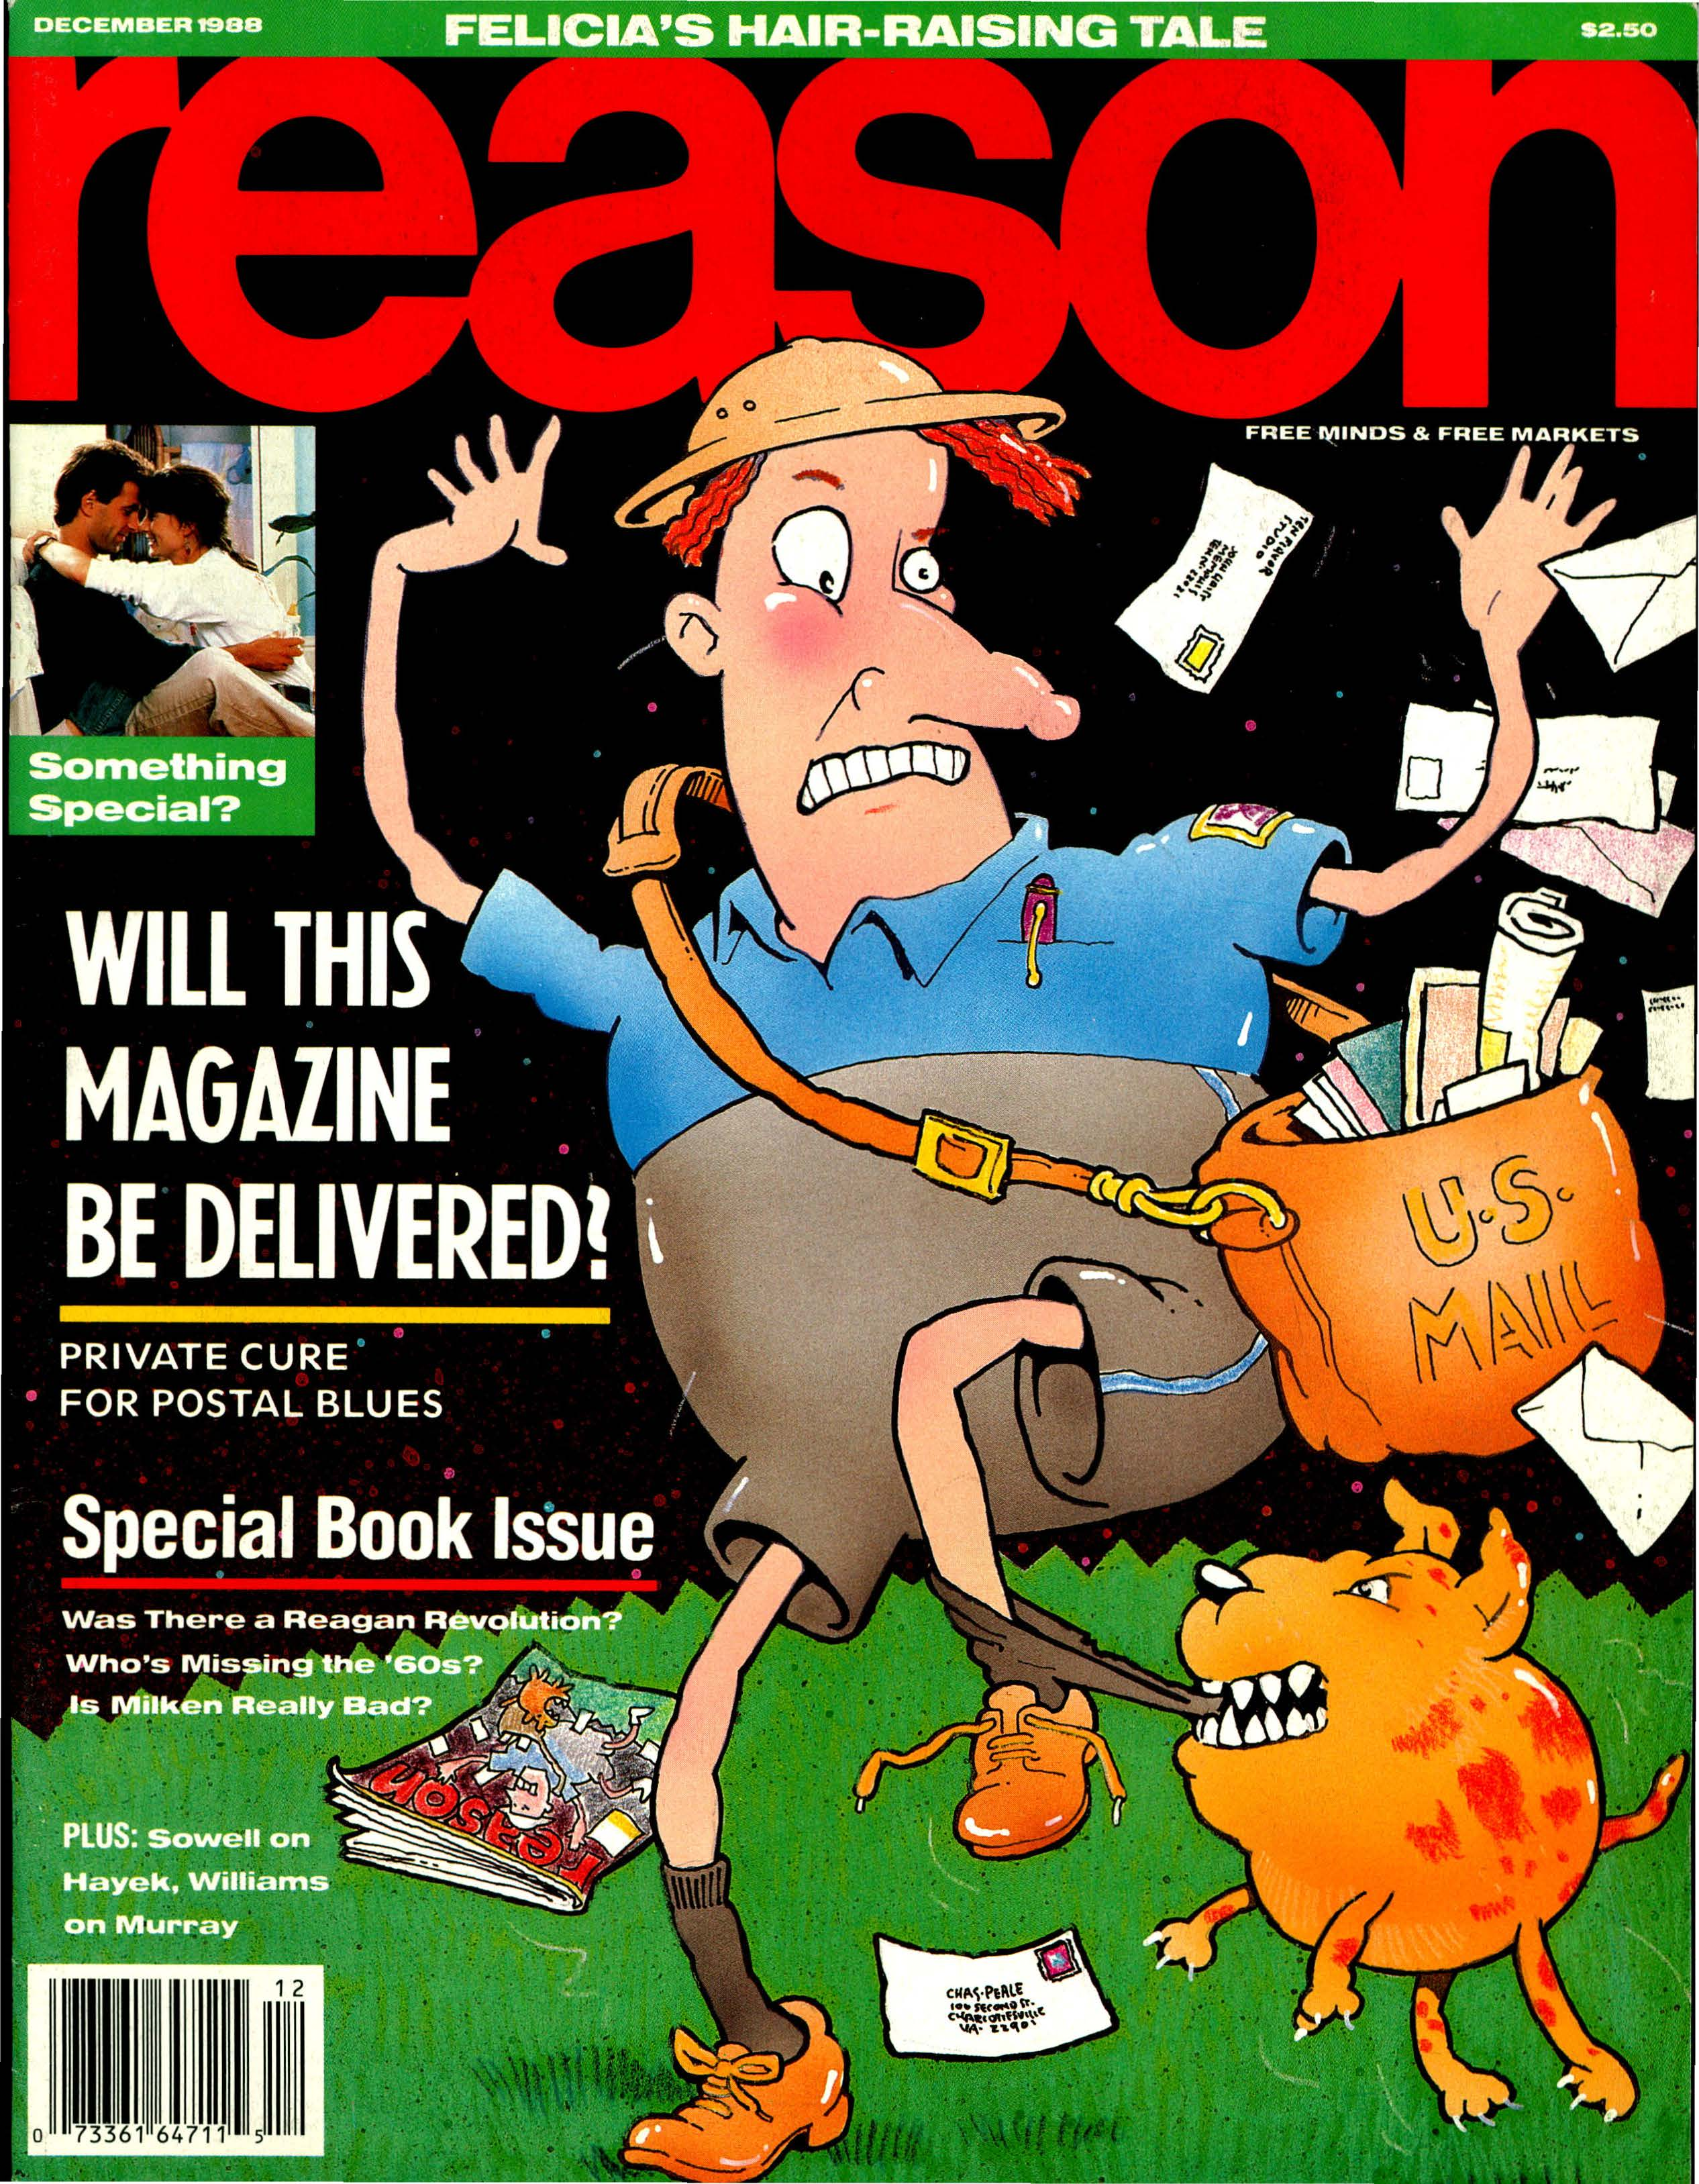 Reason Magazine, December 1988 cover image